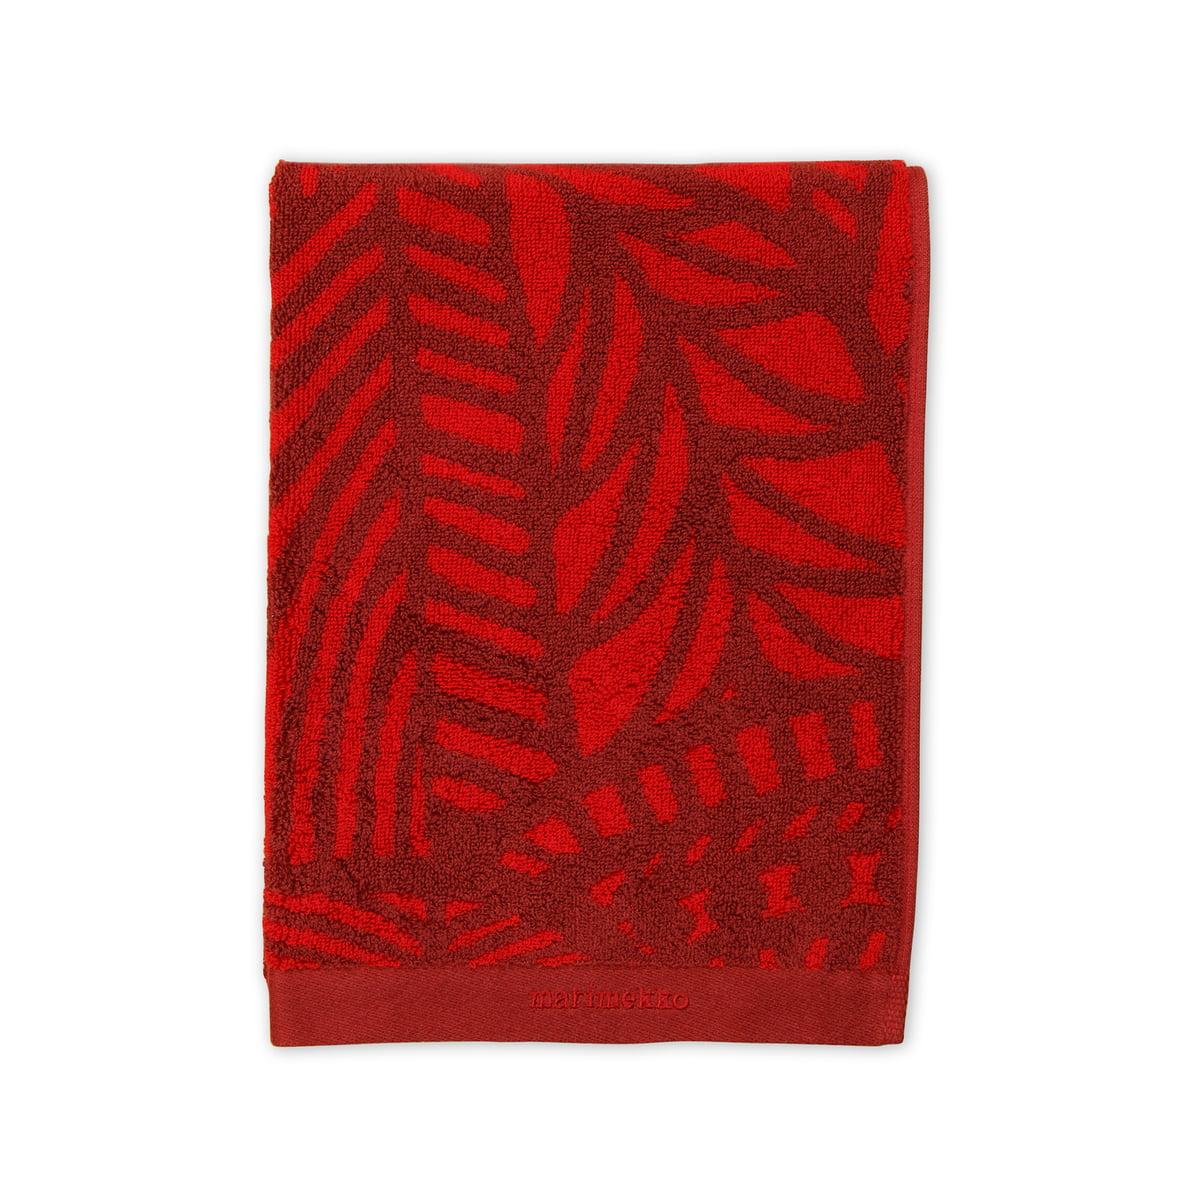 Marimekko vuorilaakso handtuch 50 x 100 cm rot dunkelrot.jpg